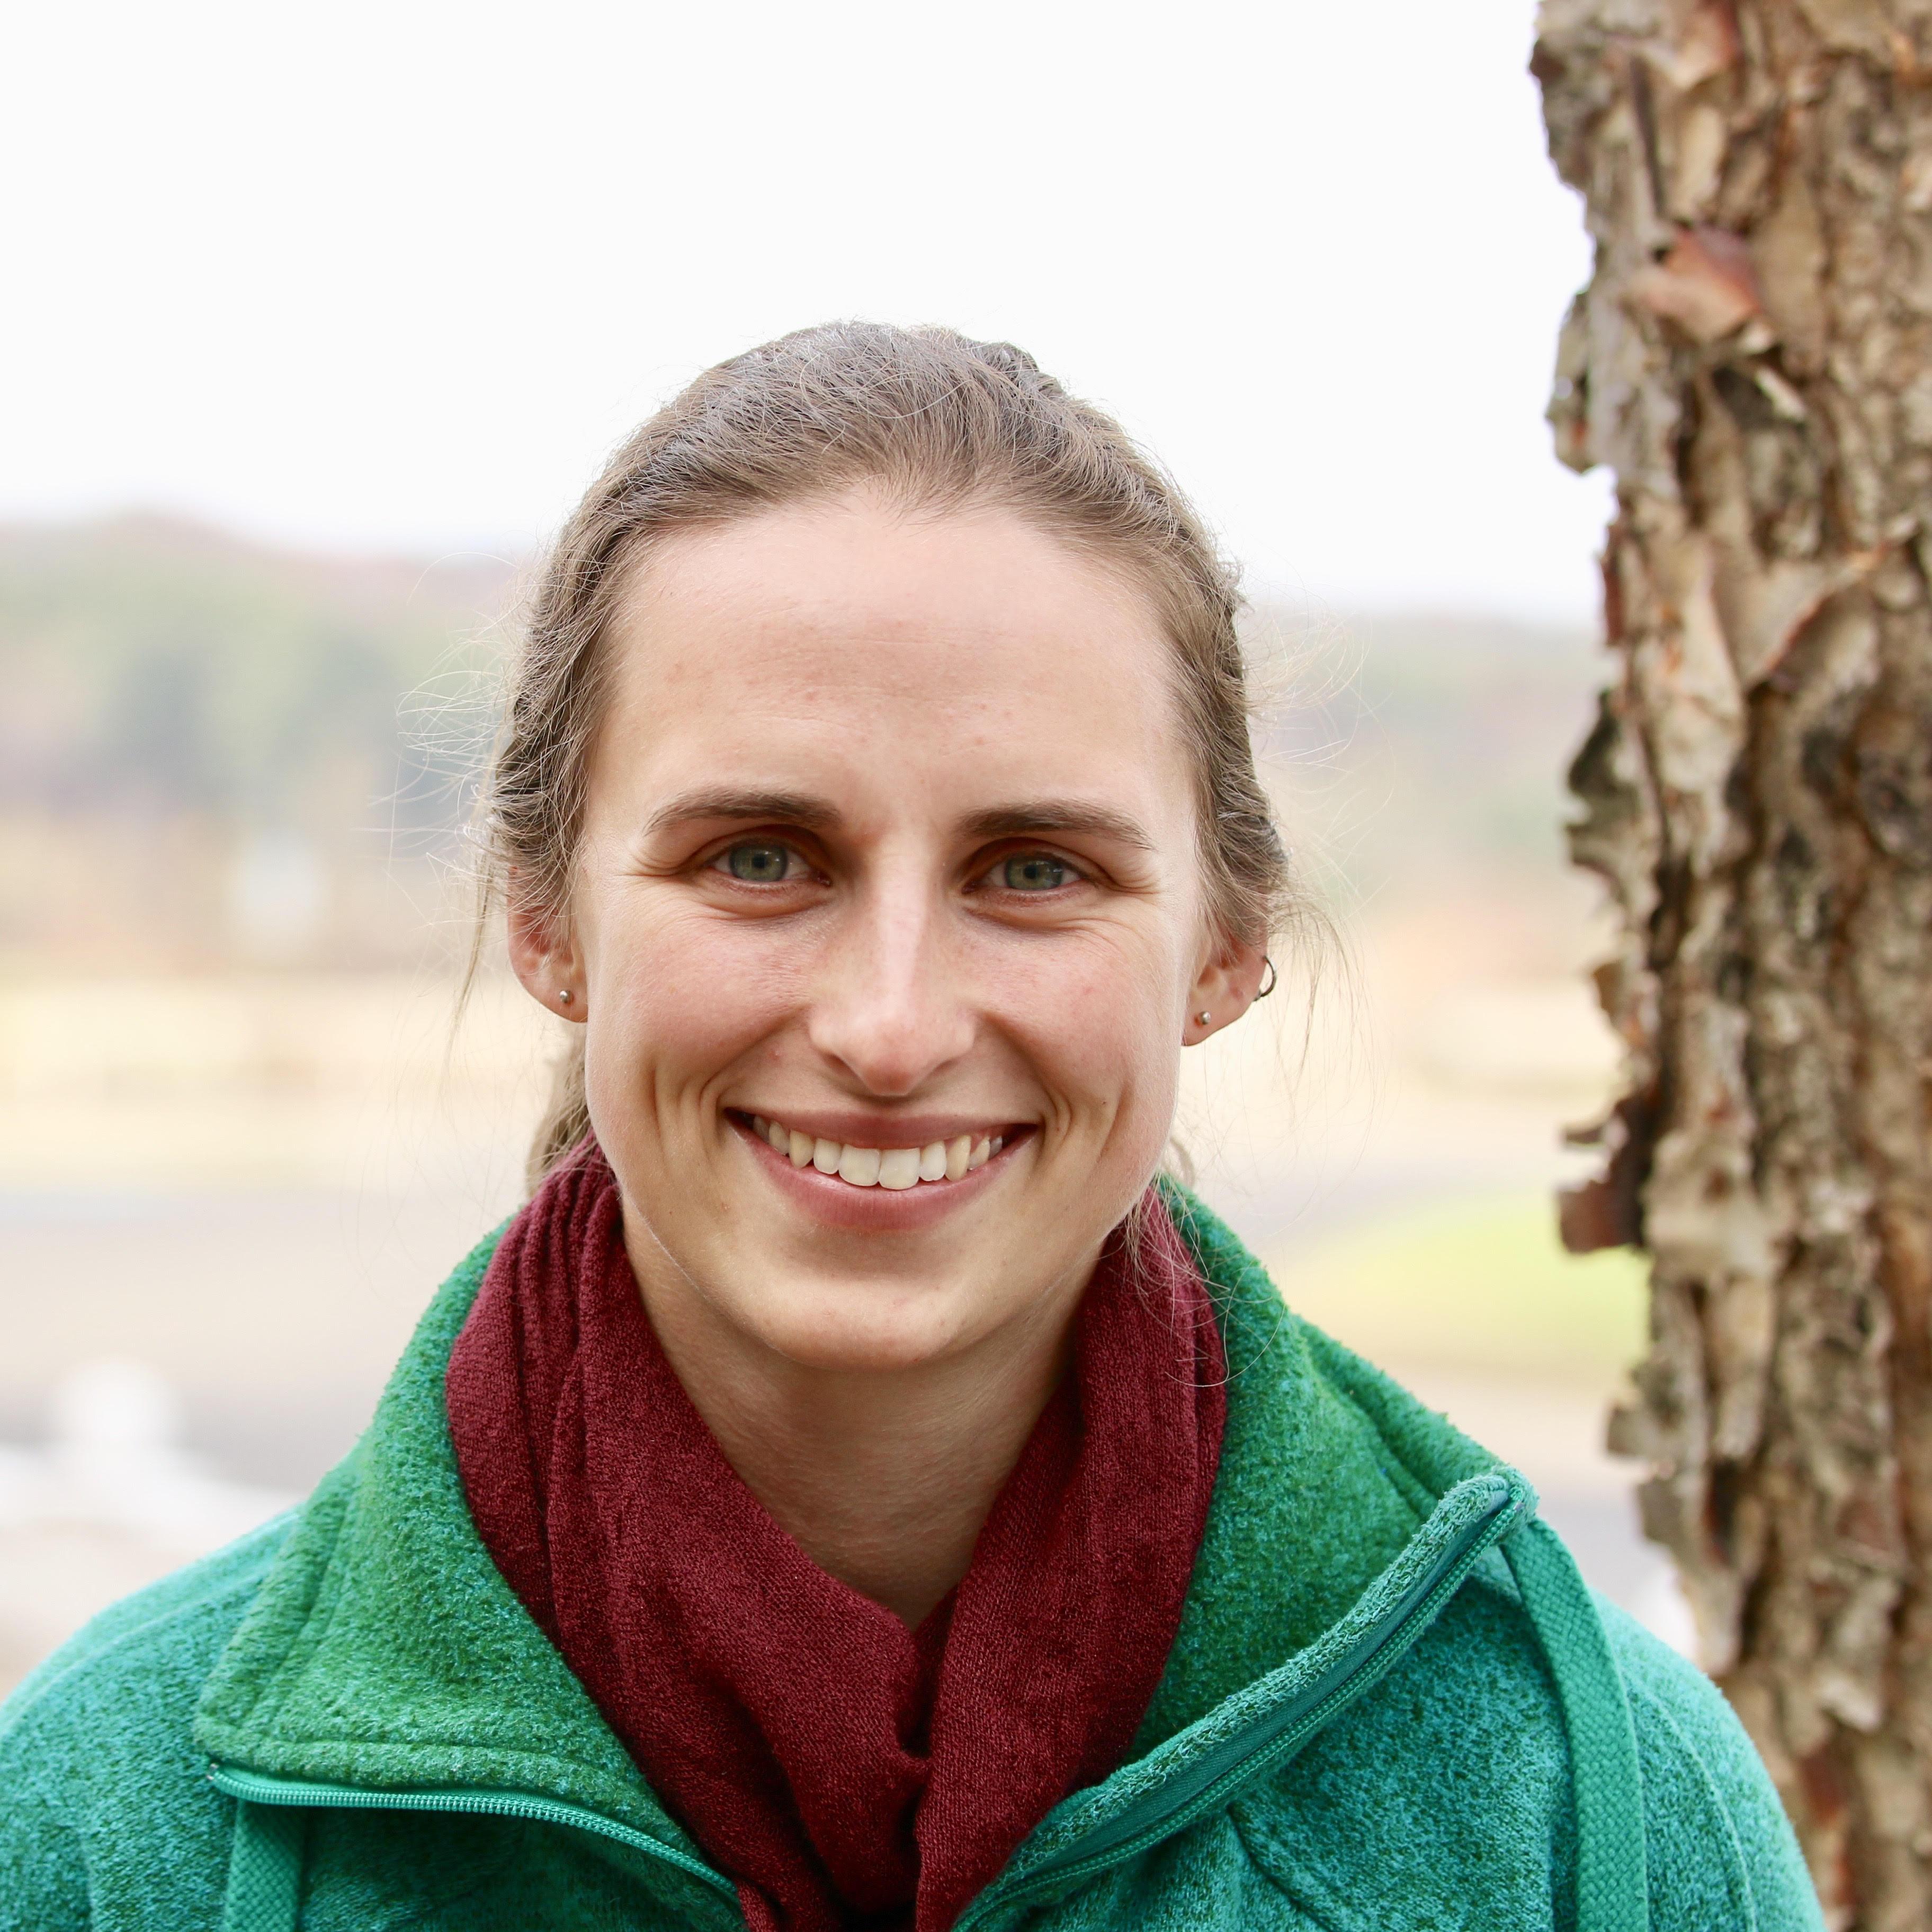 Emma Erler